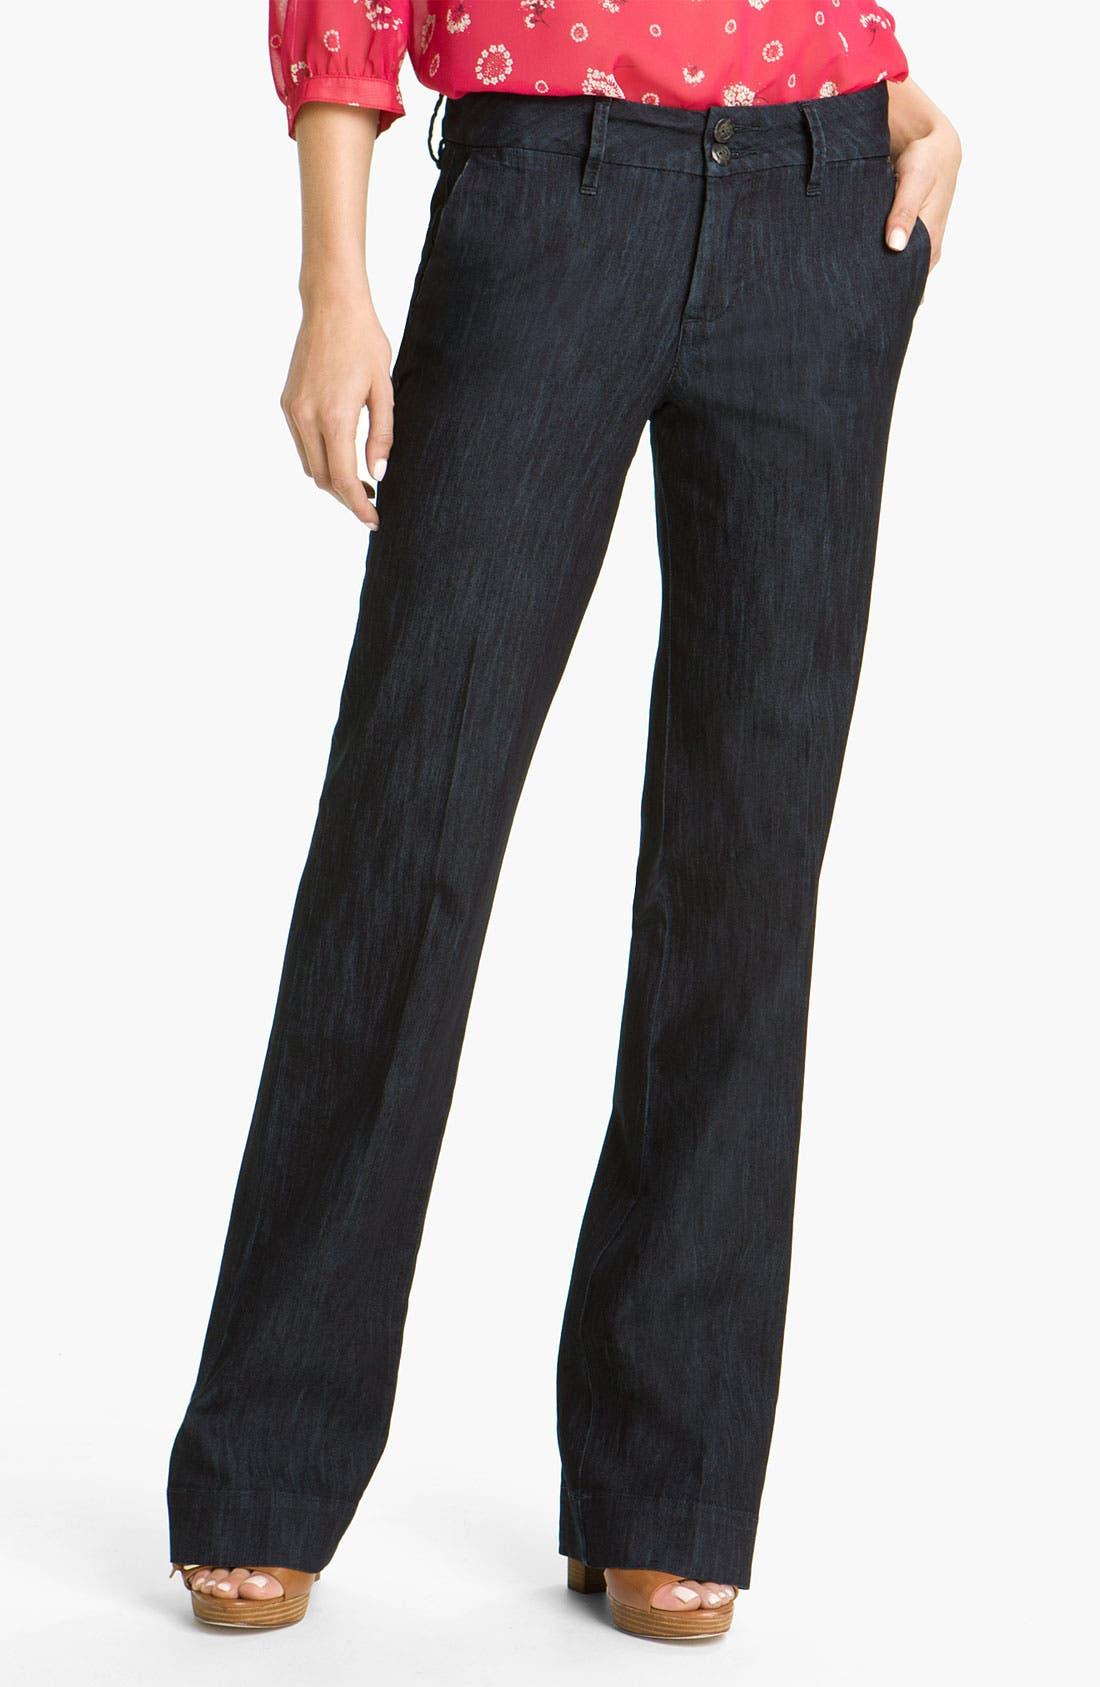 Alternate Image 1 Selected - Jag Jeans 'Pearl' Trouser Jeans (Dark Storm Wash)